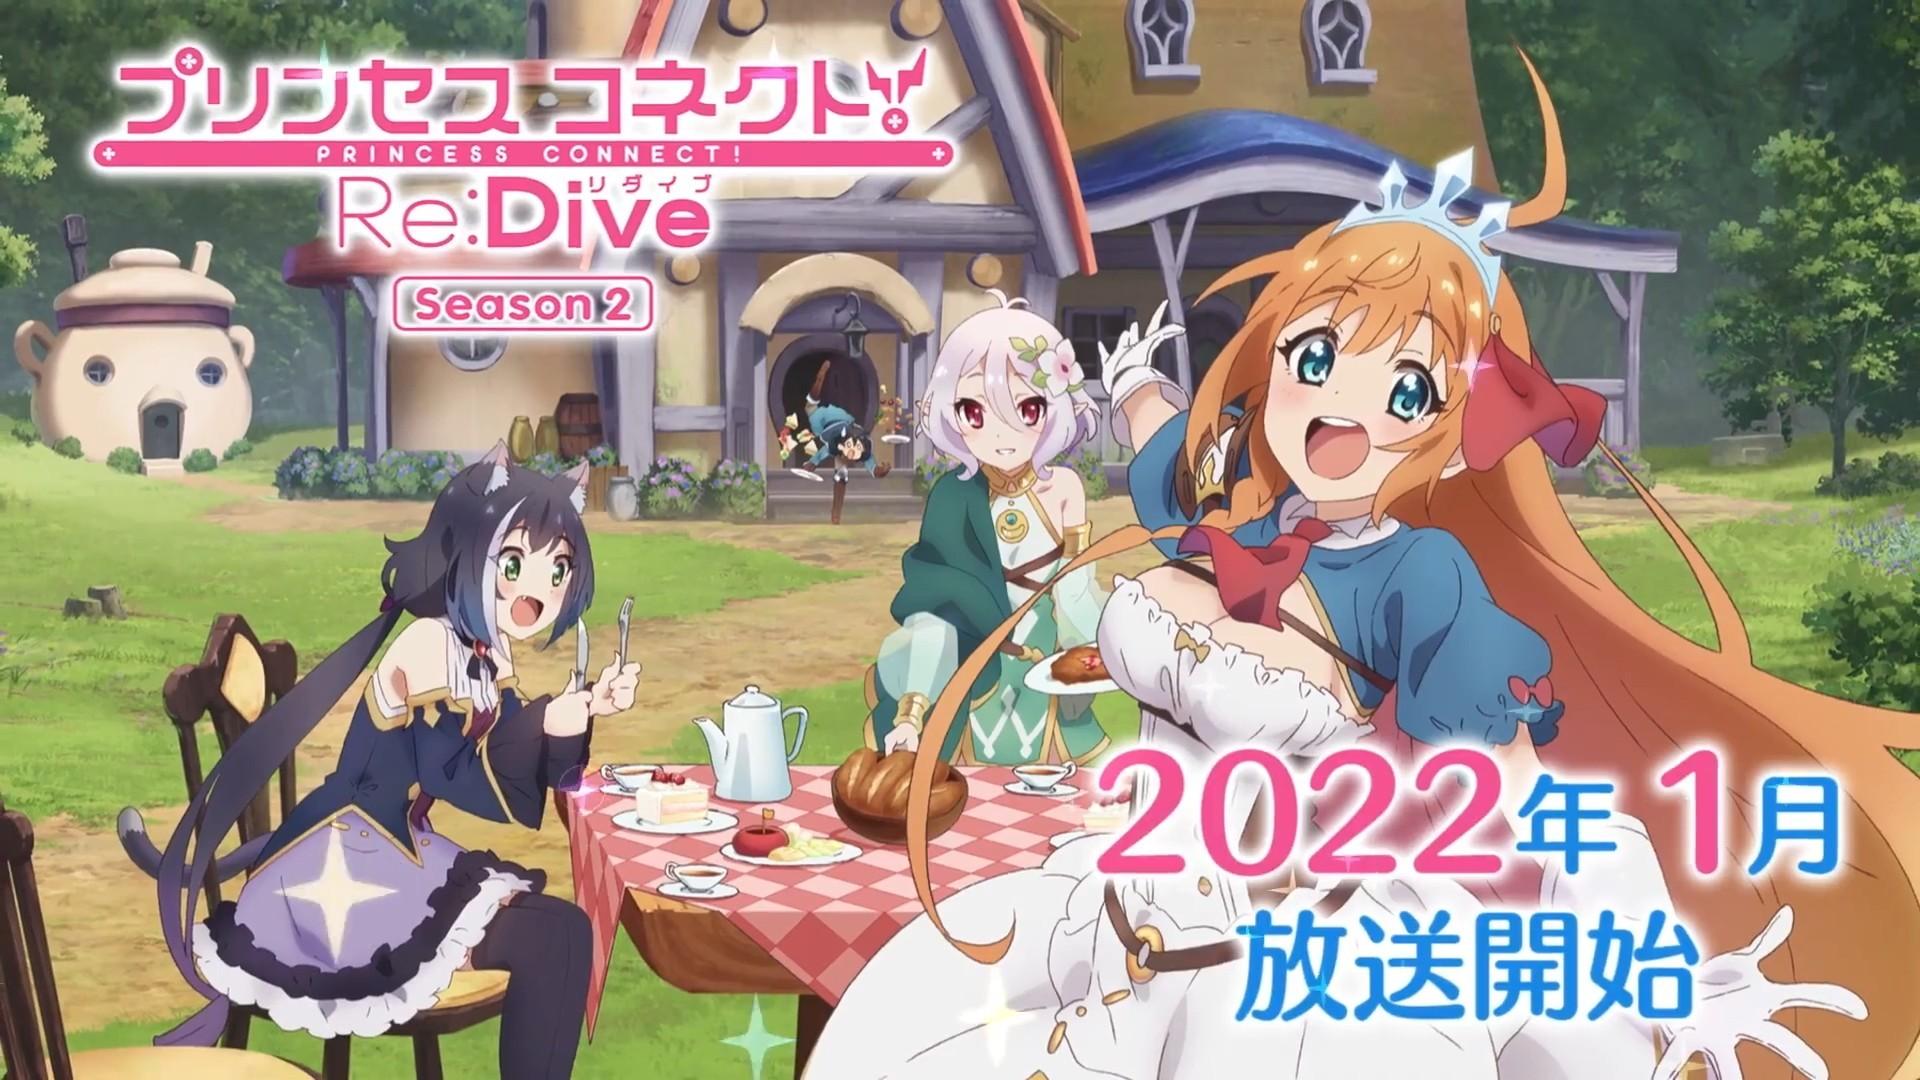 TV动画《公主连结!Re:Dive 第2季》第1弹PV公开,2022年1月开播- DIMTOWN.COM